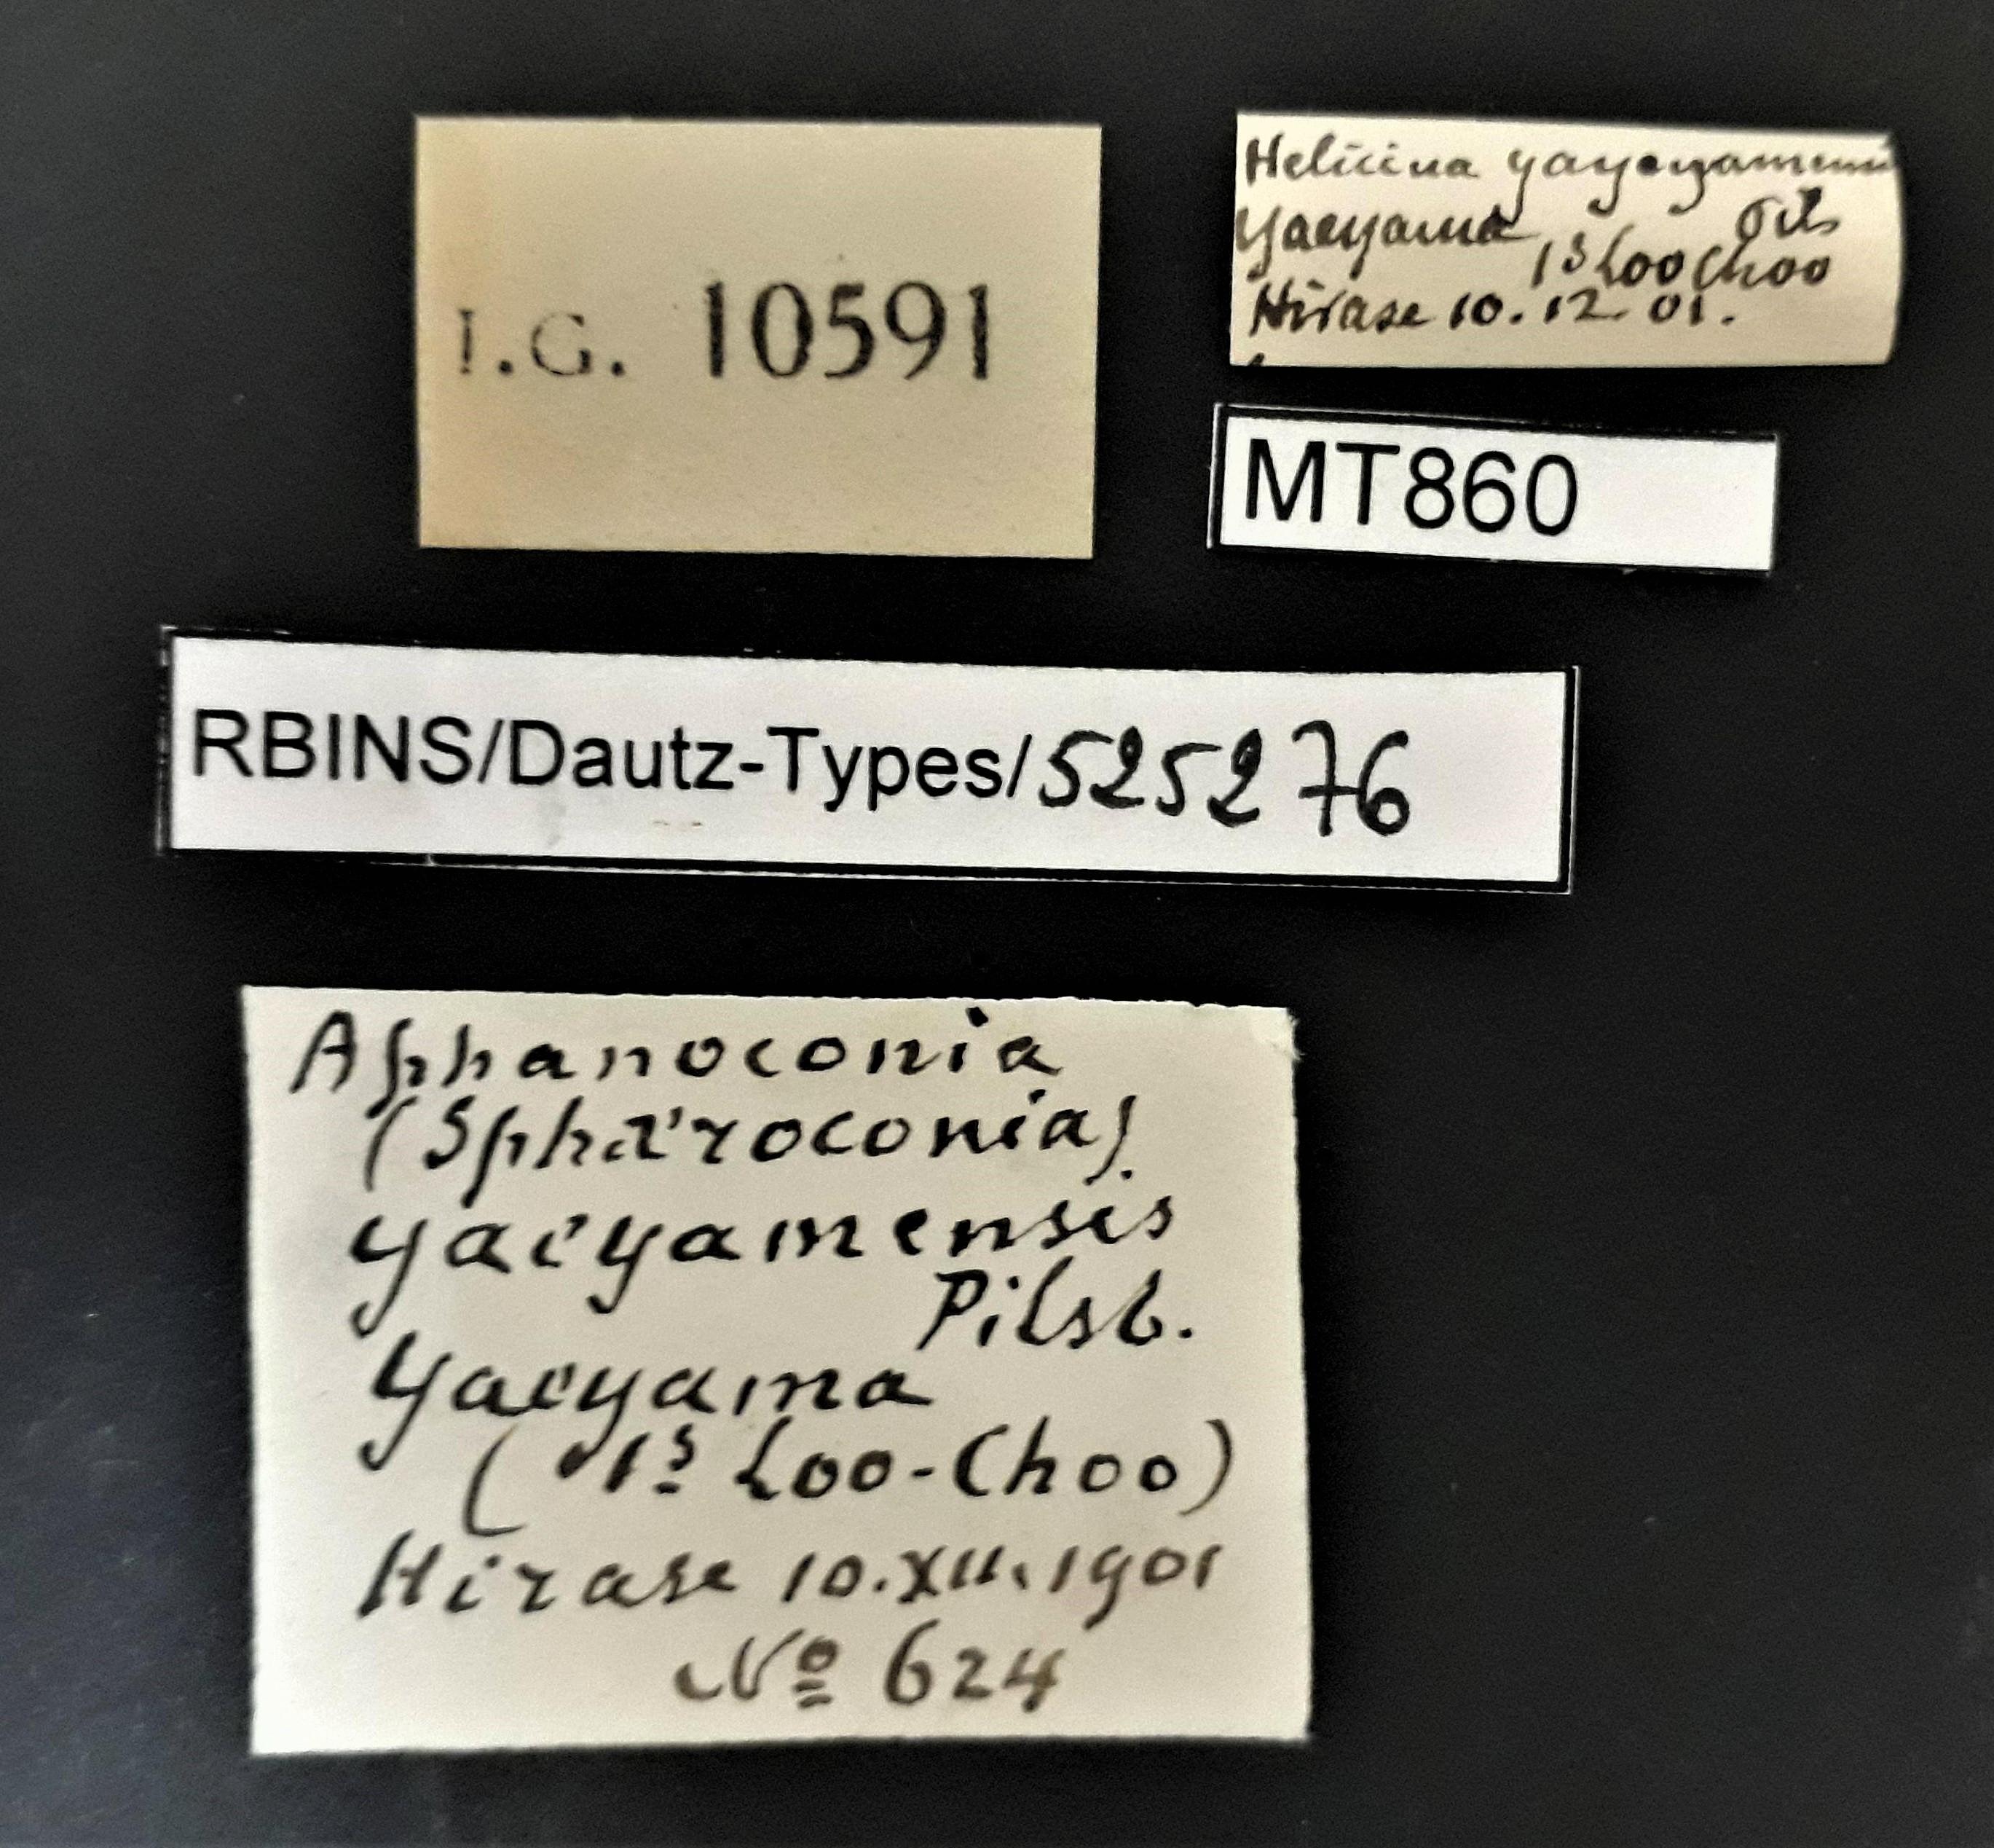 BE-RBINS-INV MT 860 Helicina yaeyamensis pt Lb.jpg